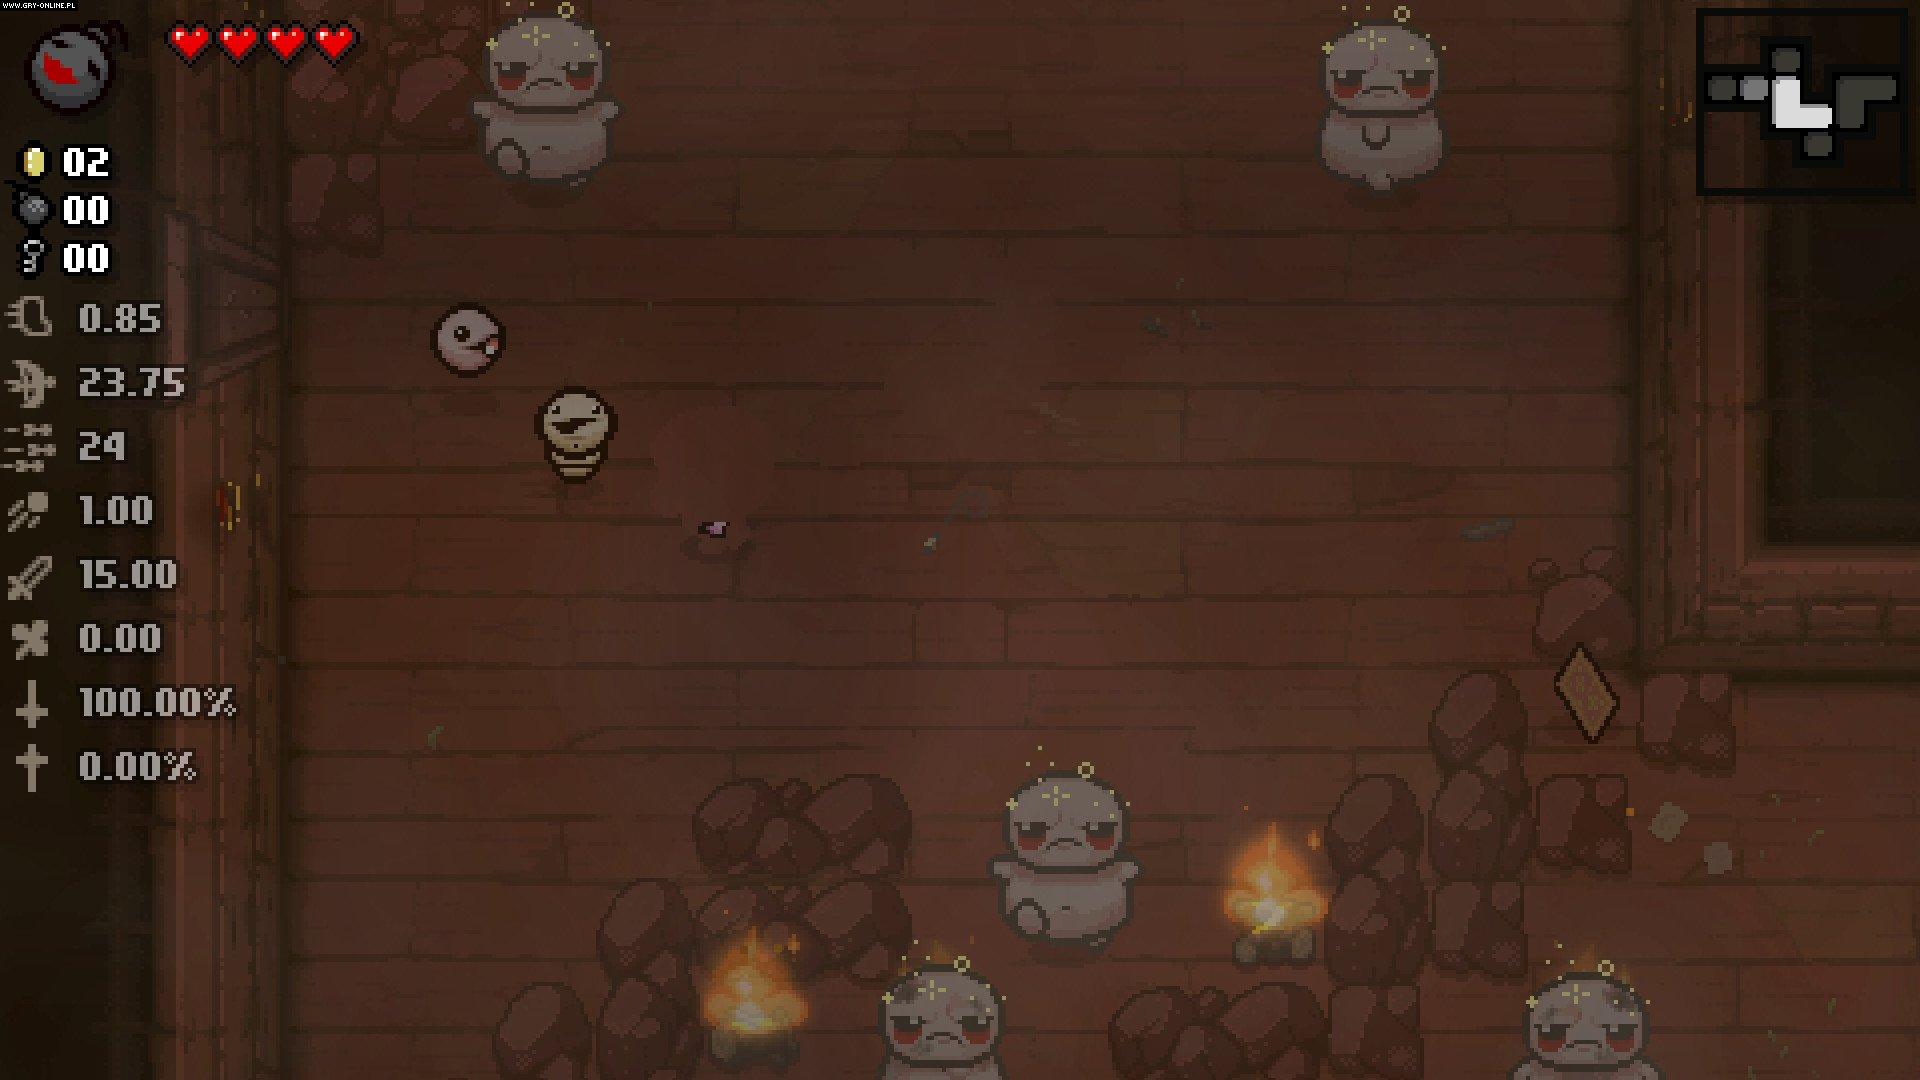 The Binding of Isaac: Afterbirth+ PC, PS4, XONE Games Image 4/7, Nicalis